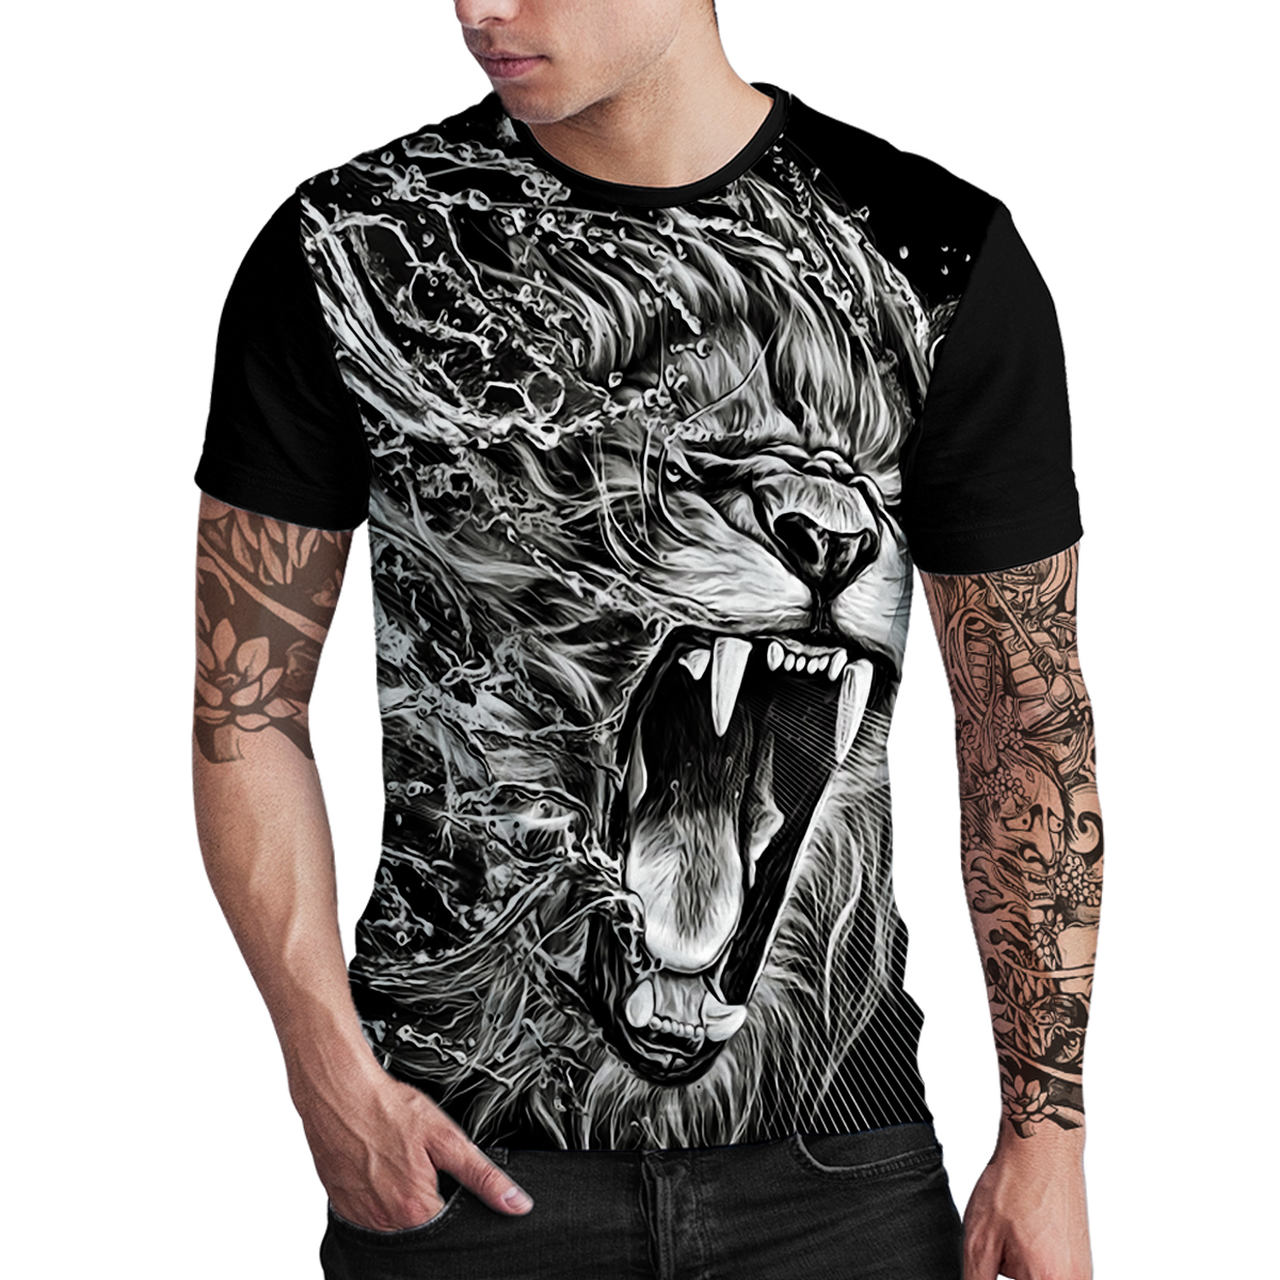 Stompy Camiseta Estampada Masculina Modelo 81